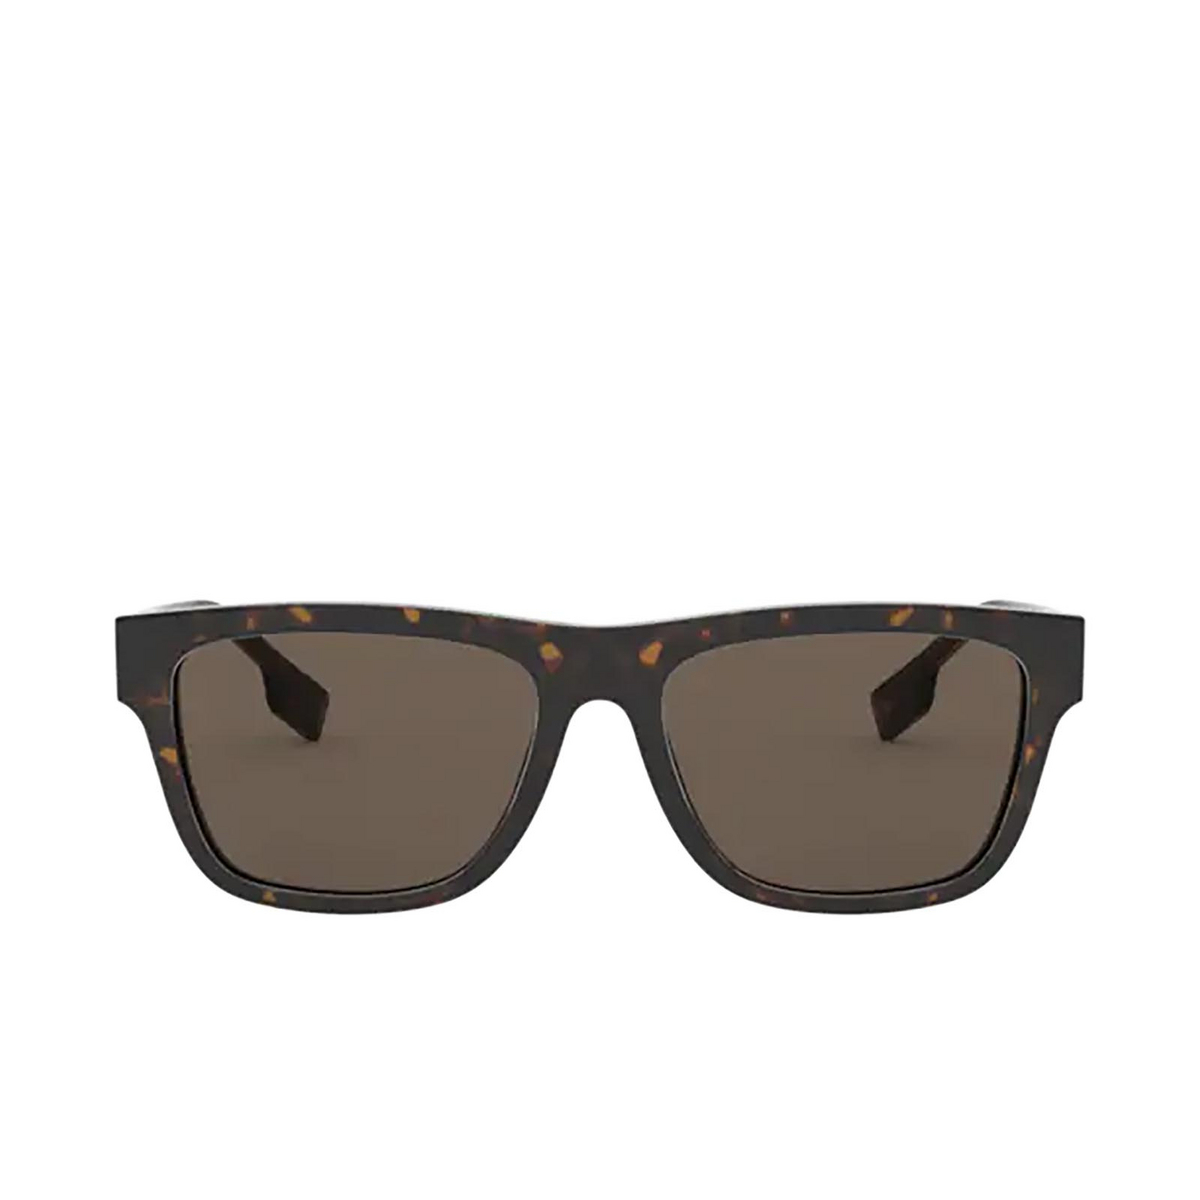 Burberry® Square Sunglasses: BE4293 color Dark Havana 3002/3 - front view.